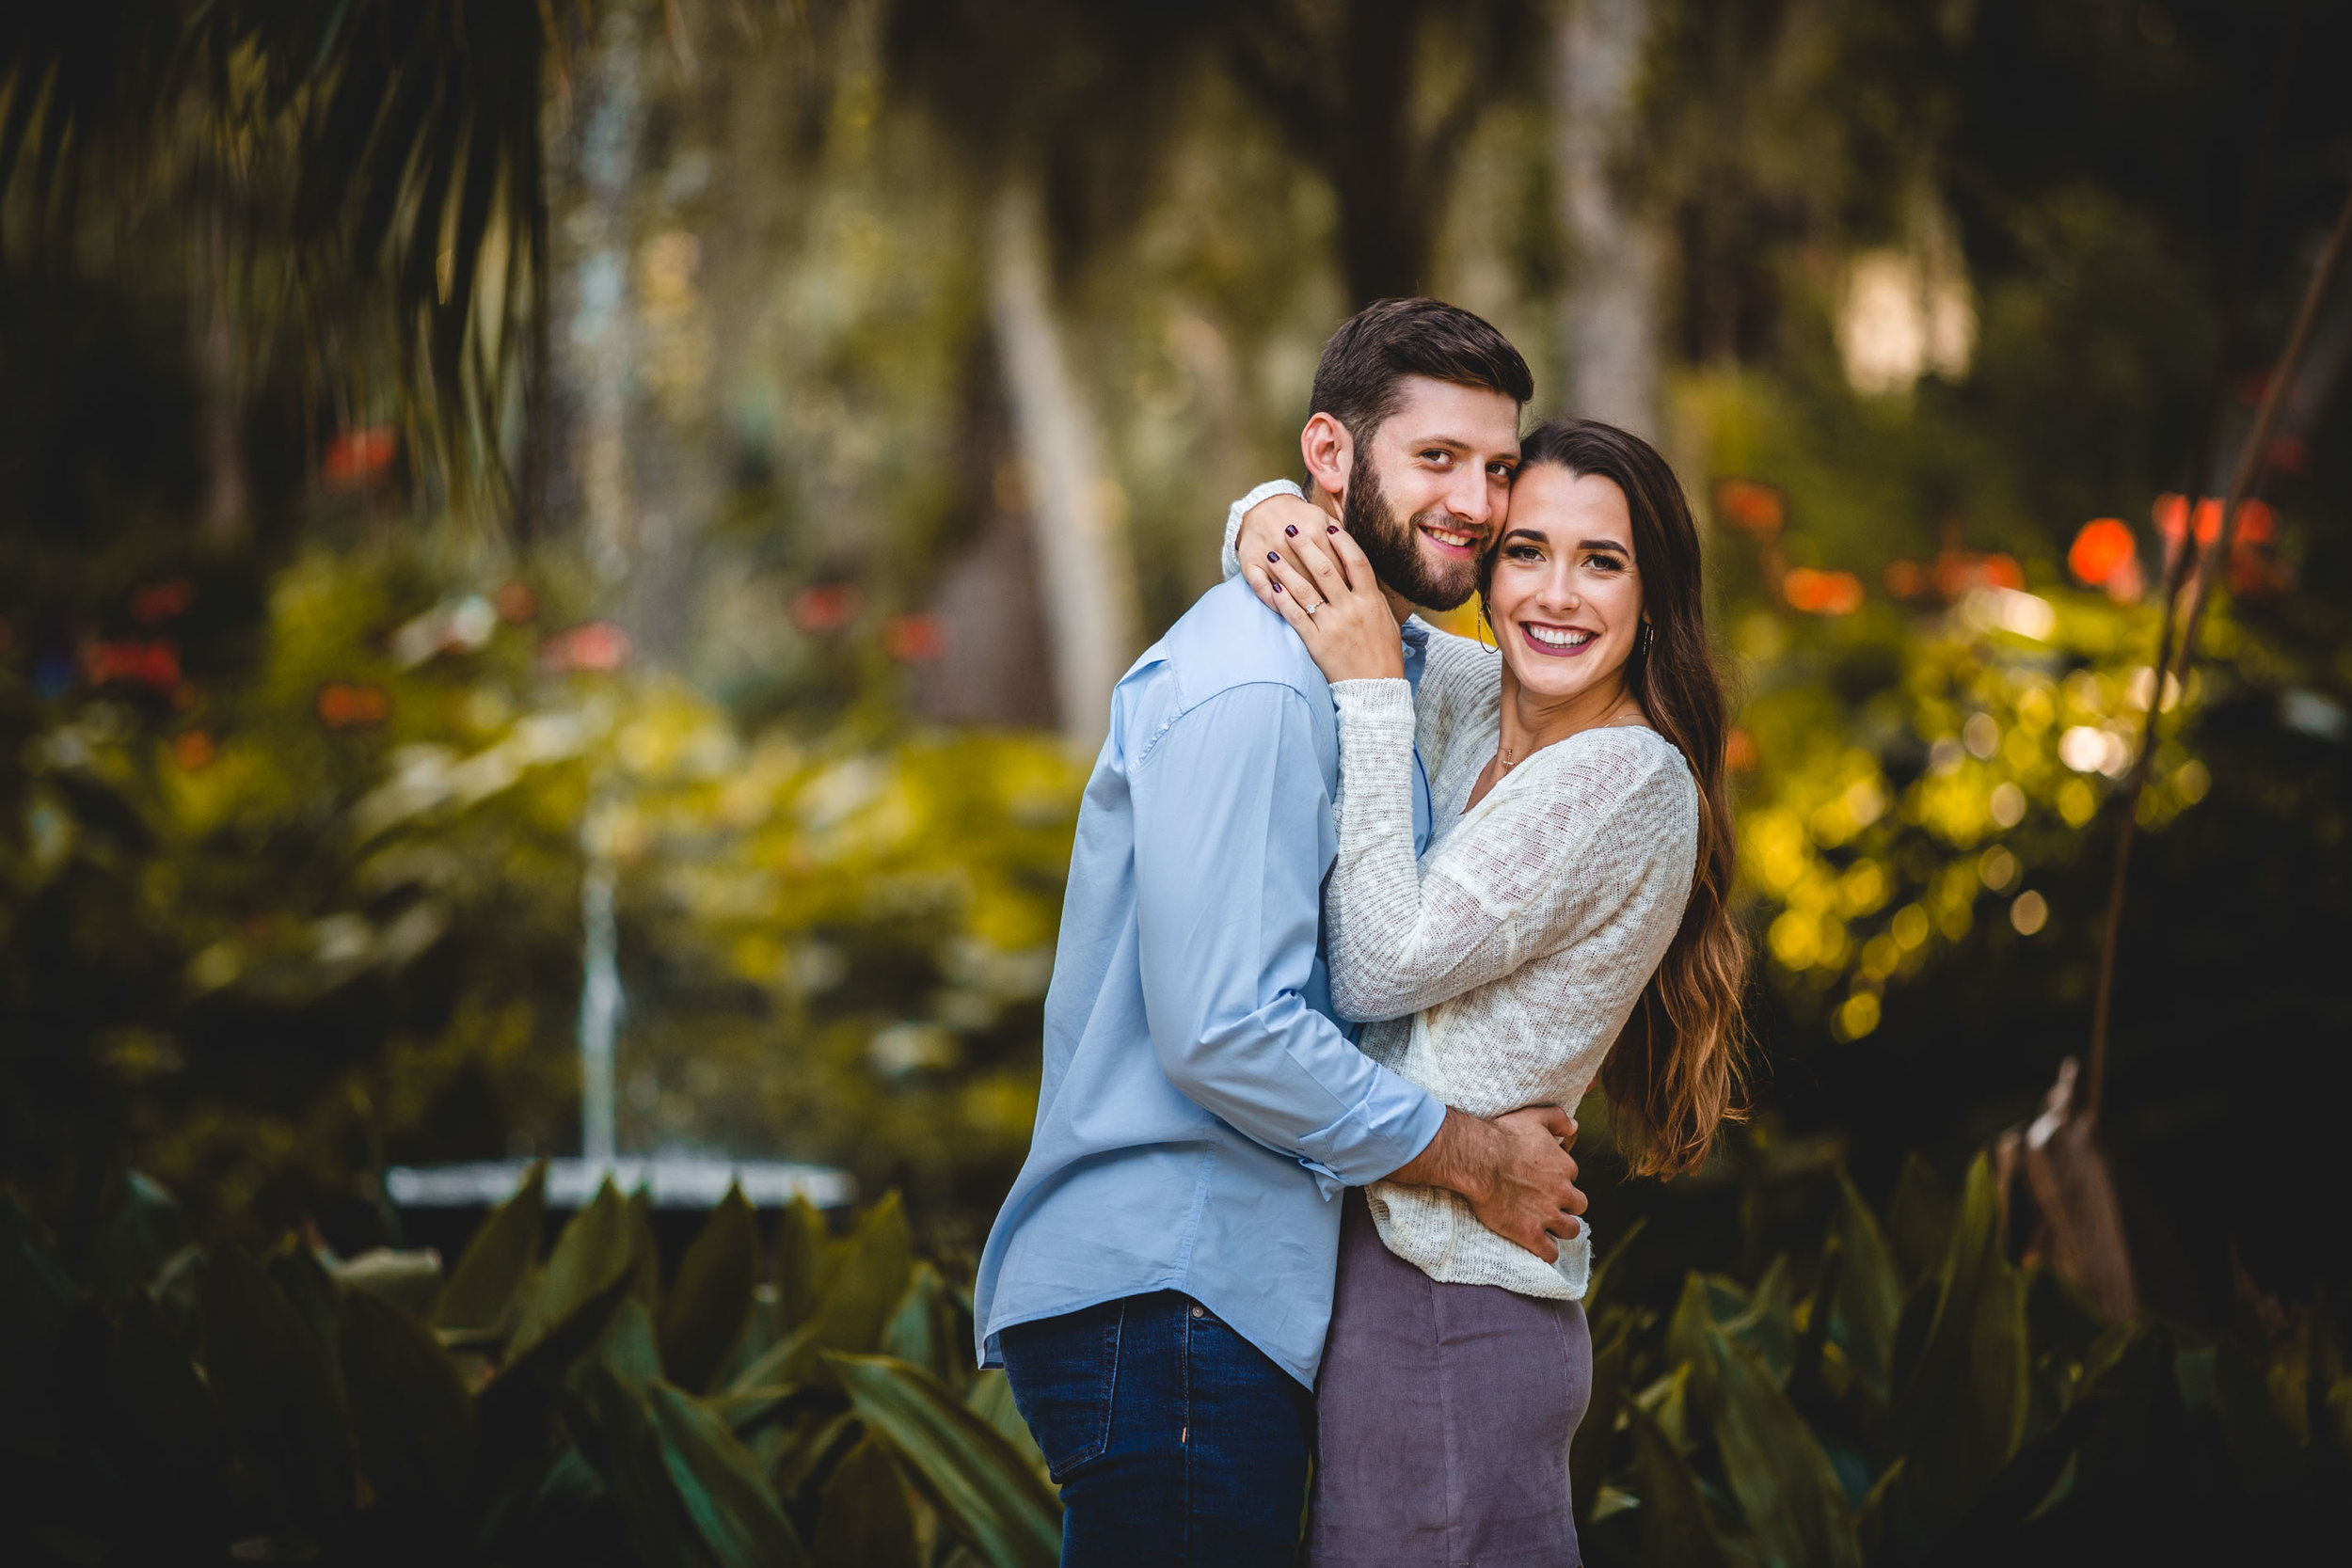 adam-szarmack-jacksonville-wedding-photographer-palm-coast-washing-oaks-garden-state-park-engagement-32.jpg